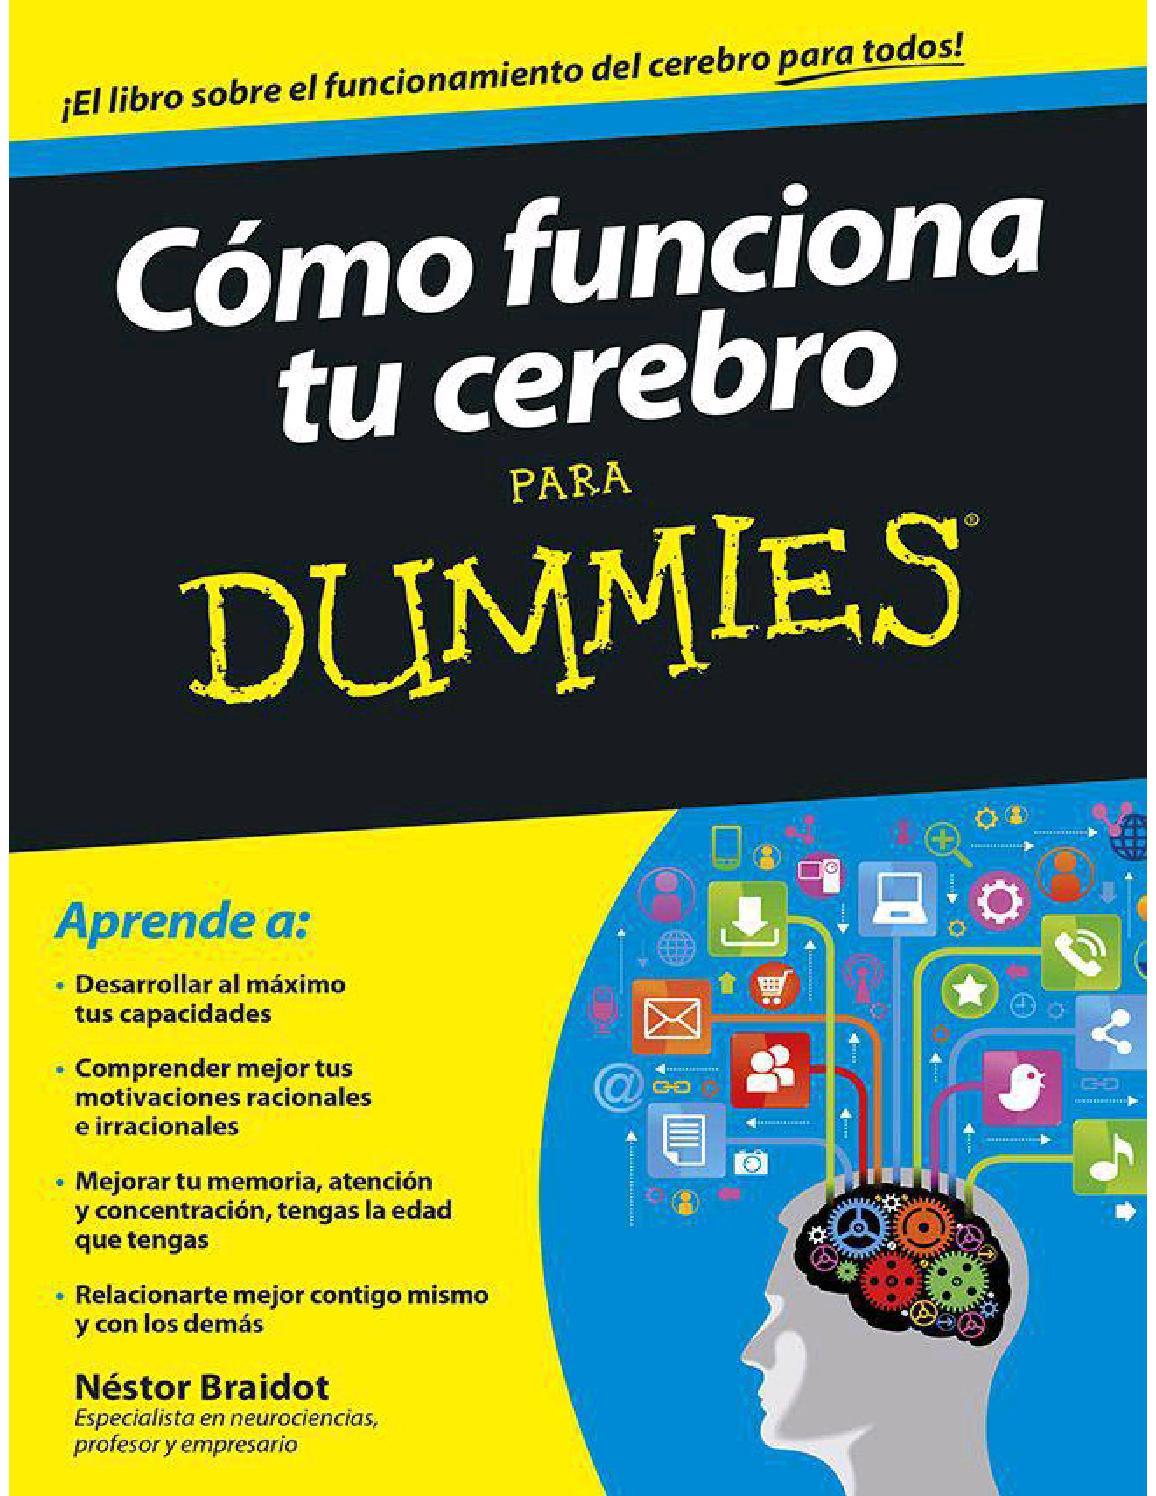 Como funciona tu cerebro para dummies (s braidot) by Arturo Zamorano ...